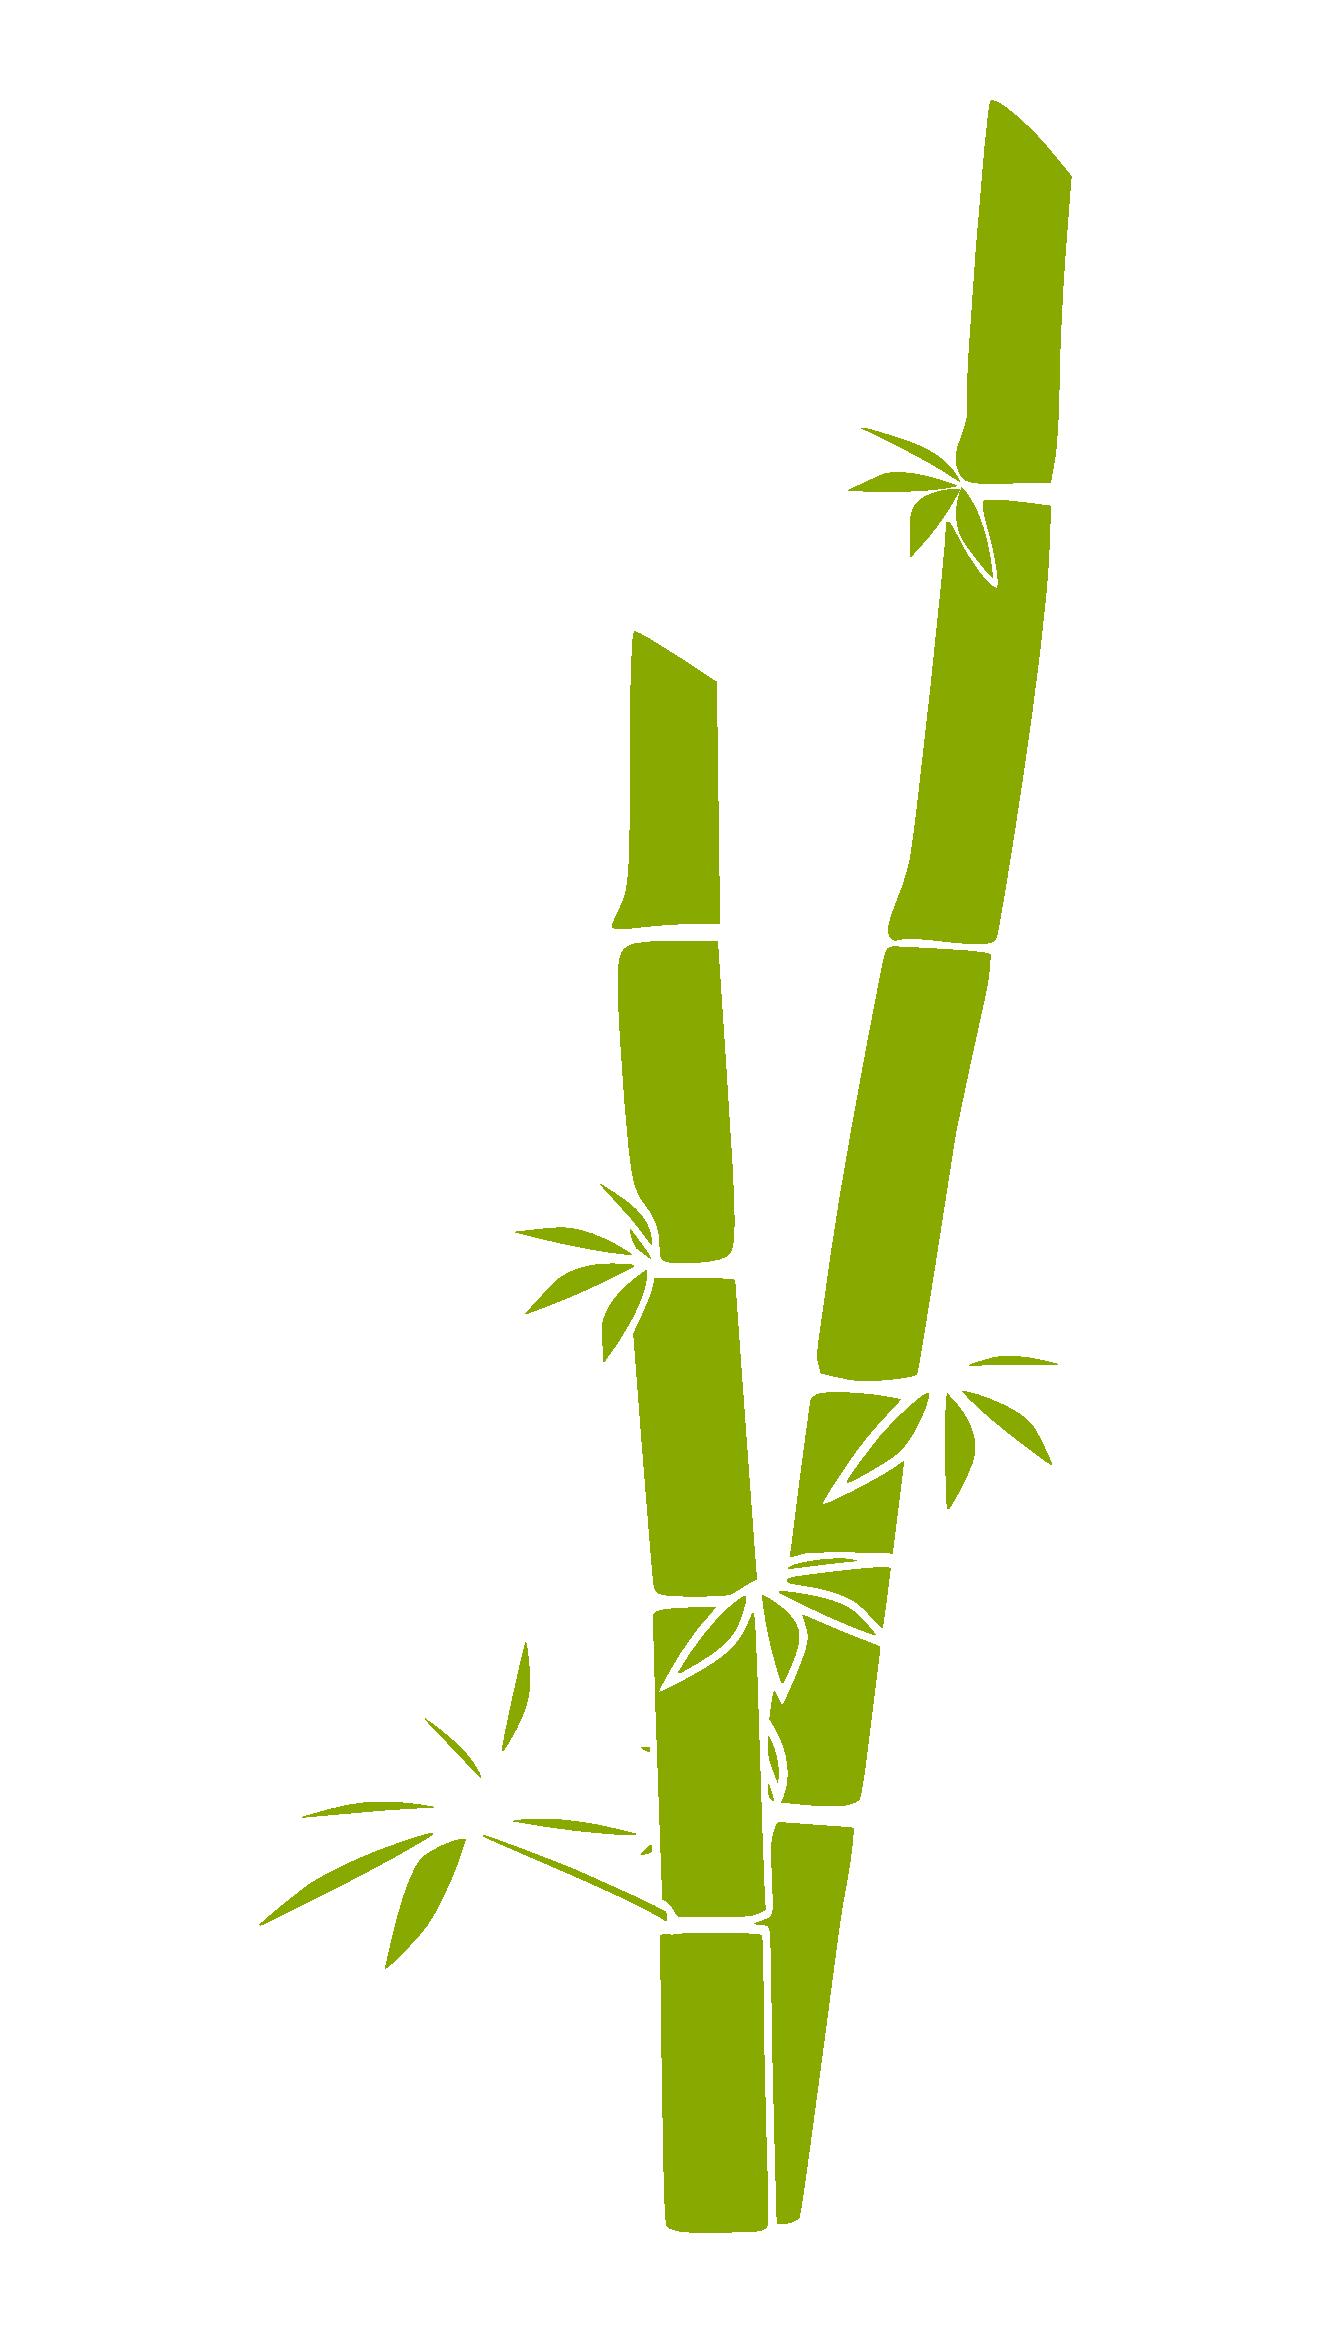 Bamboo Grass Tree 114 555px.png ...-Bamboo Grass Tree 114 555px.png ...-1